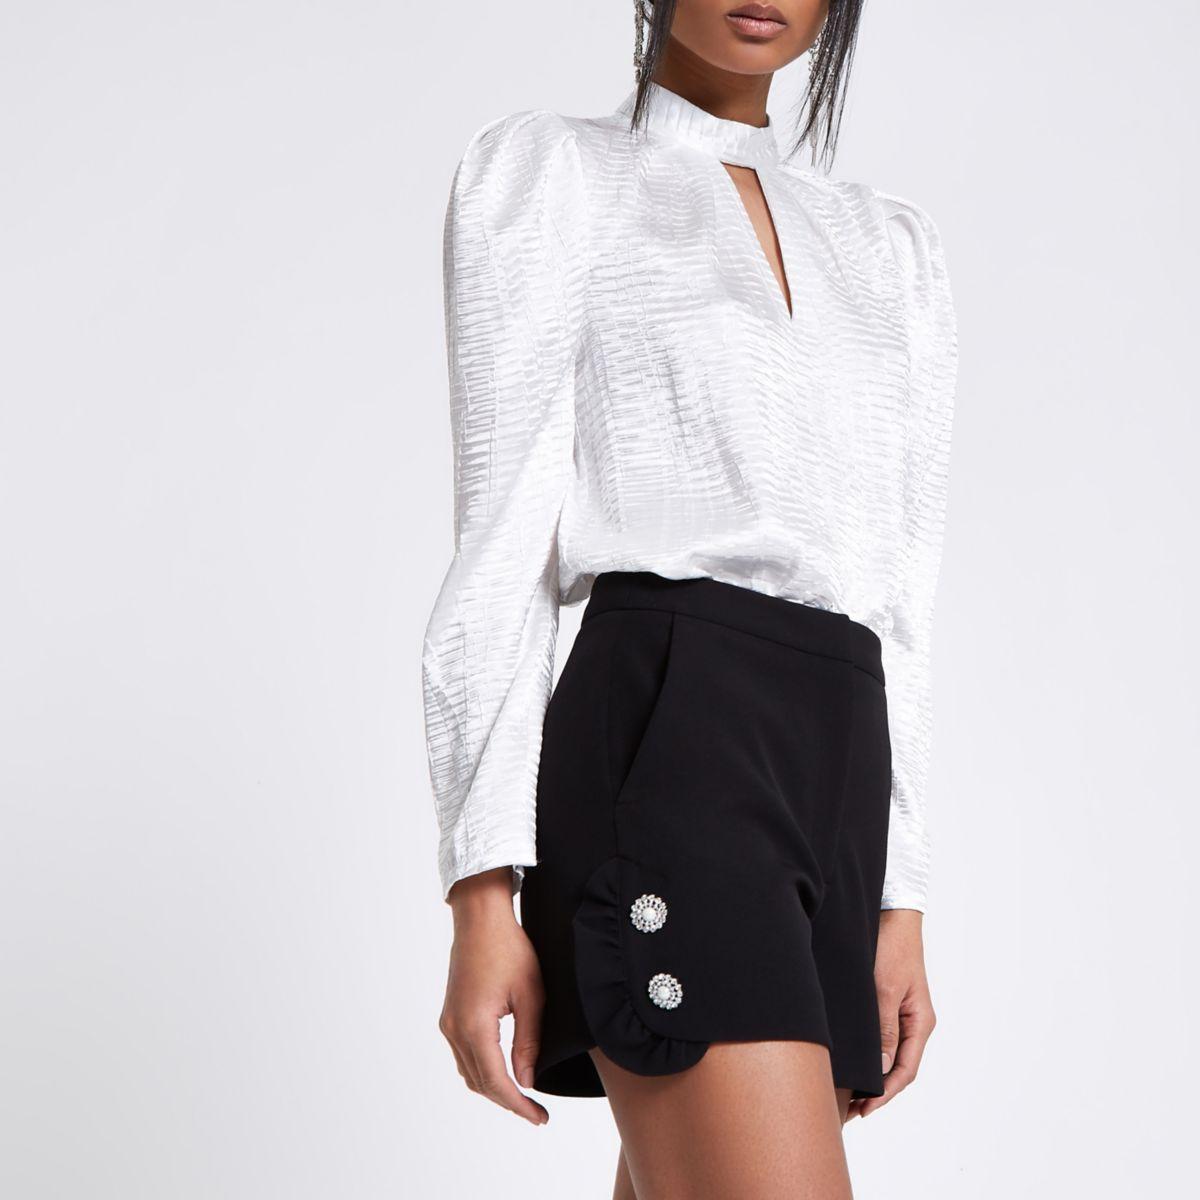 Black rhinestone pearl embellished frill shorts